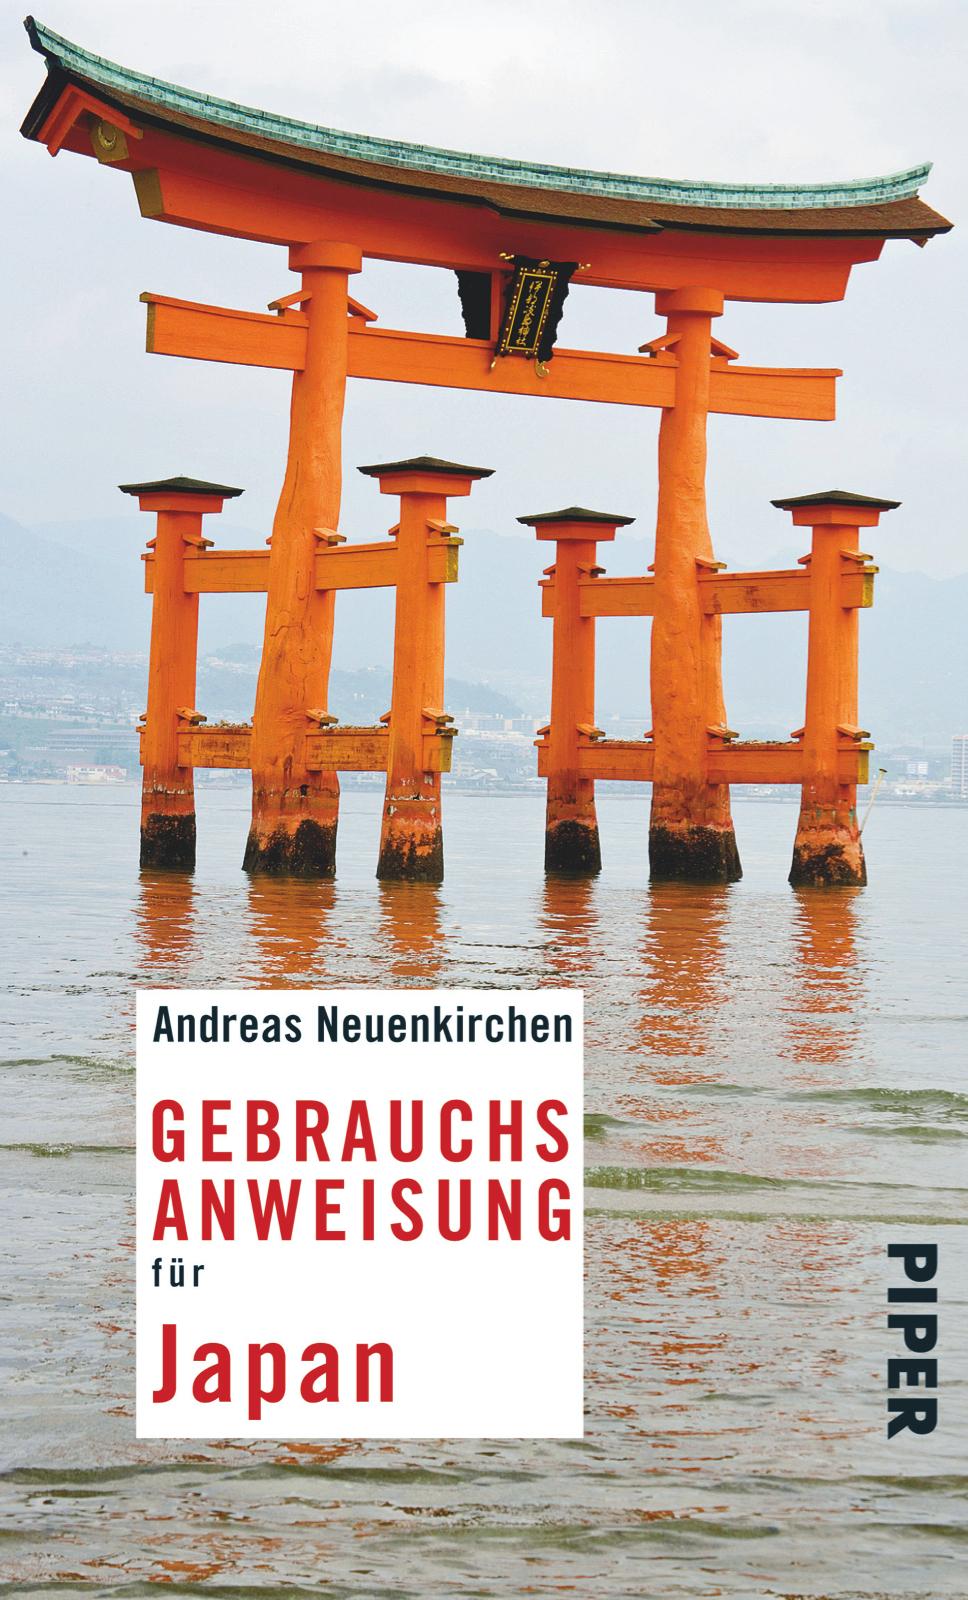 GEOBUCH Event 09. April